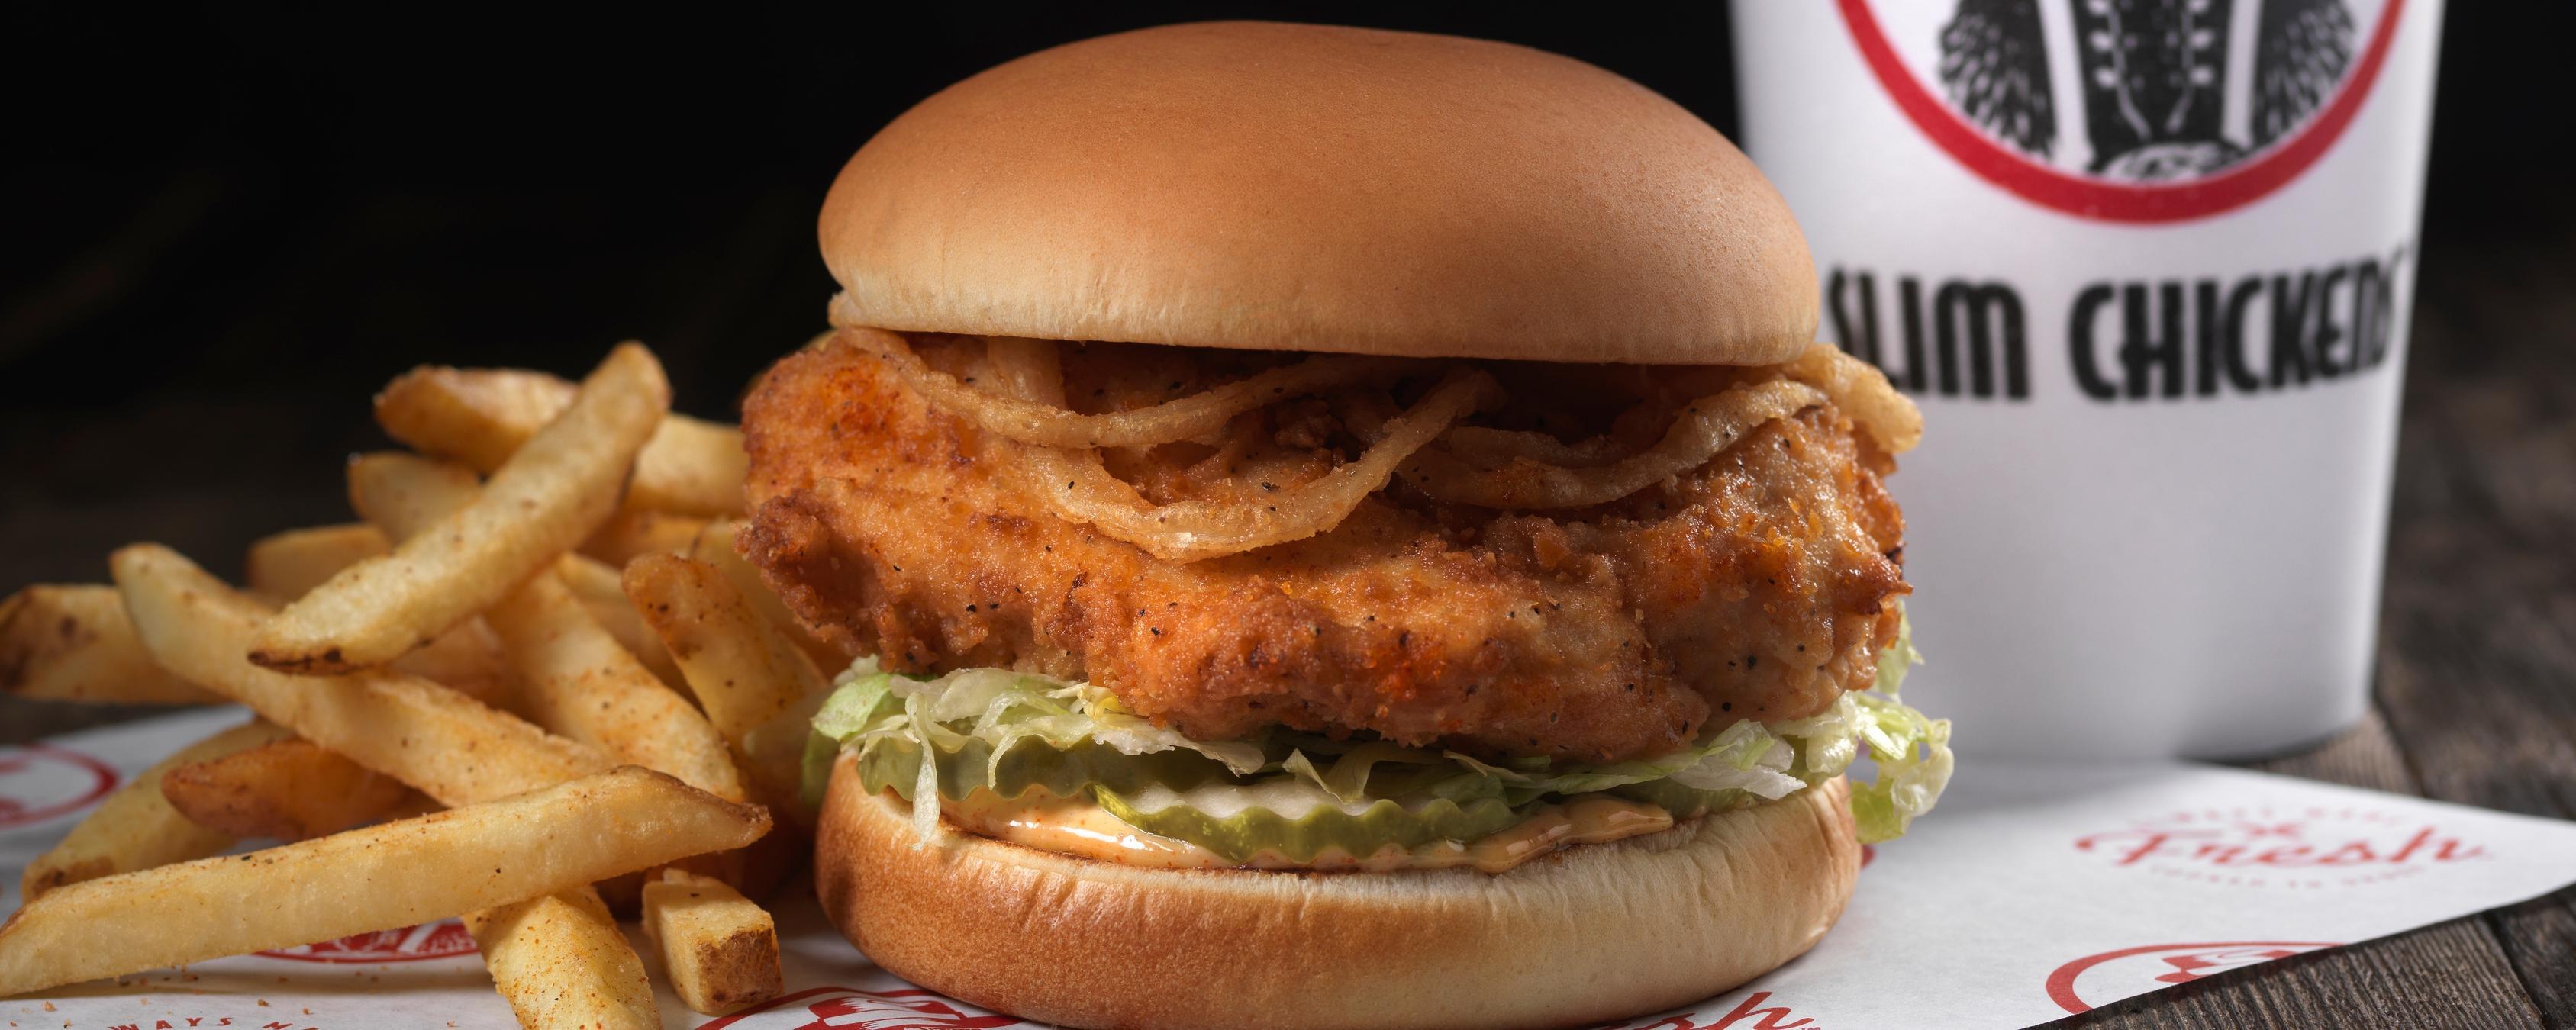 Slim Chickens - Trafford Centre Brand Cover